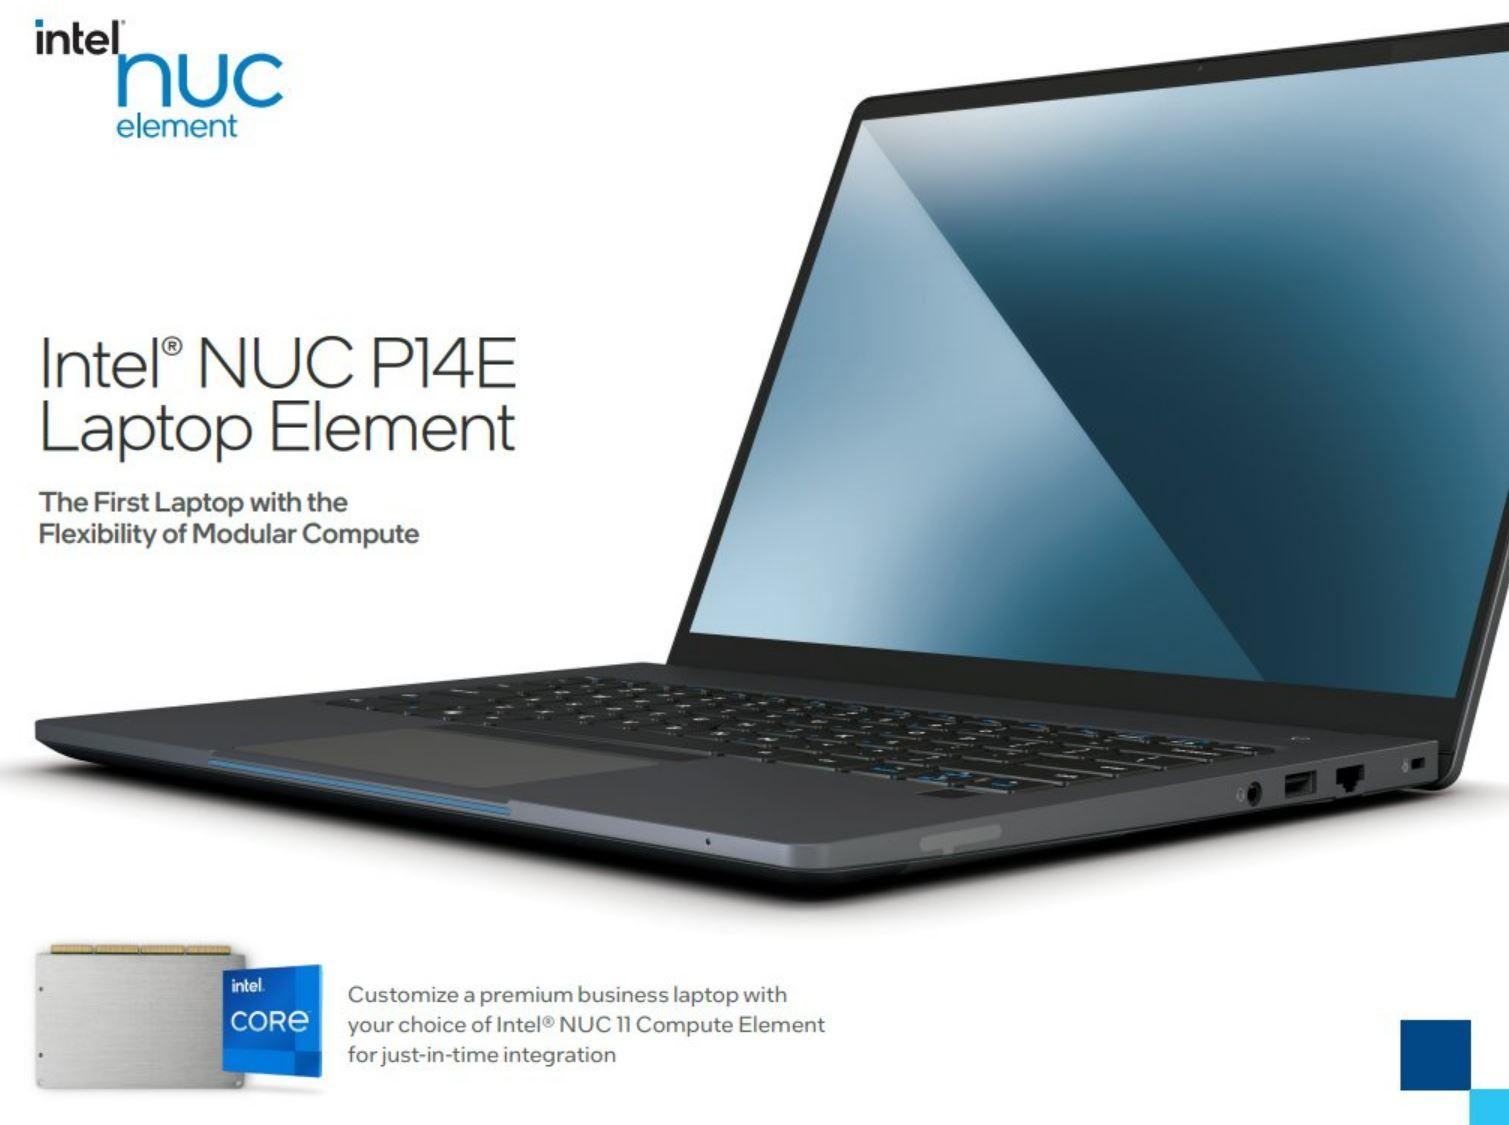 Intel NUC P14E